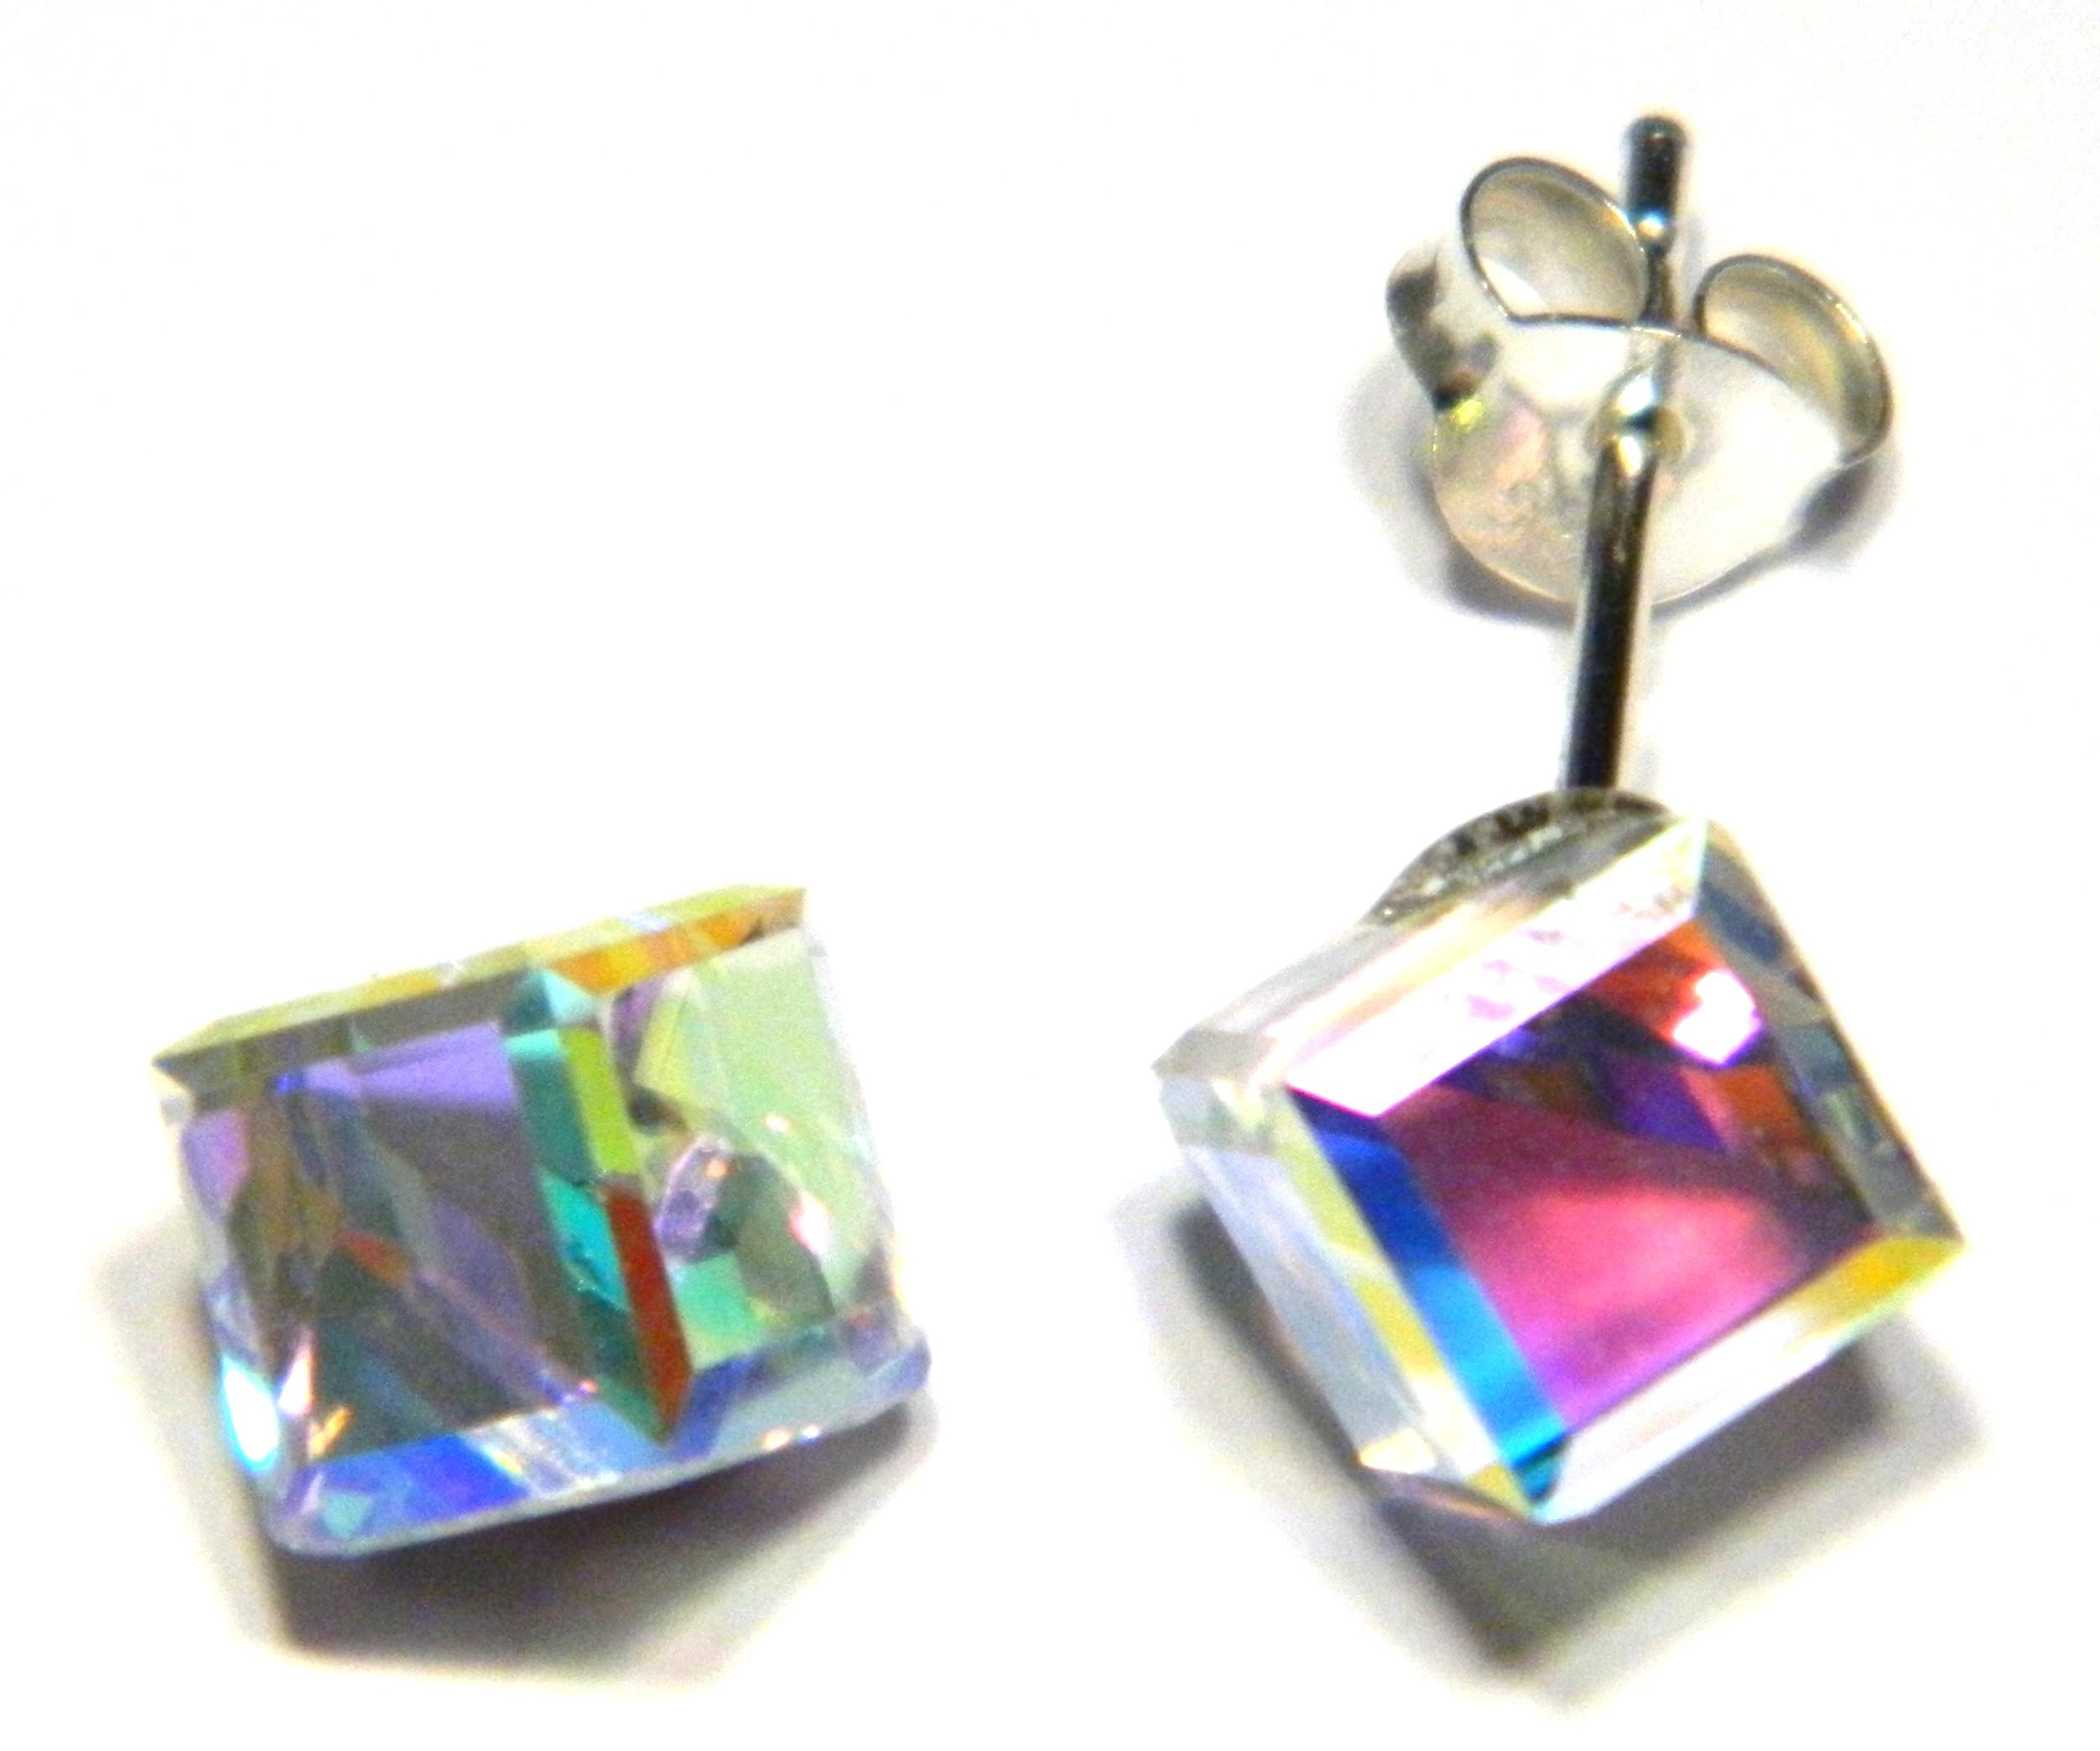 f6602b96268eb 6 mm cube aurora borealis crystal stud earrings in sterling silver